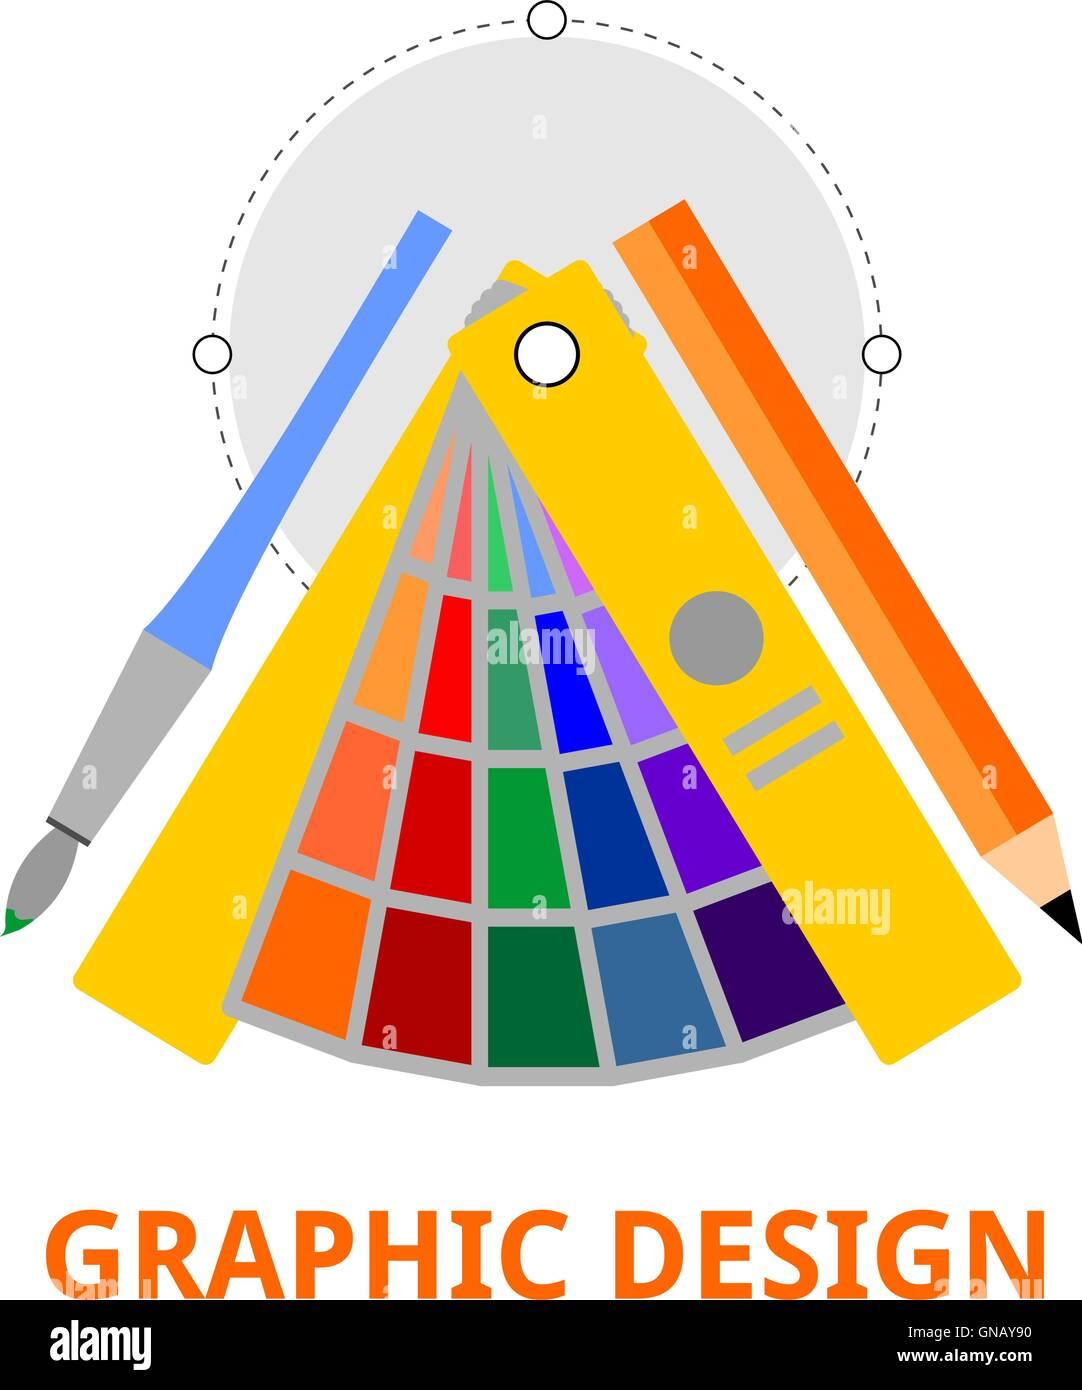 vector - graphic design - Stock Image